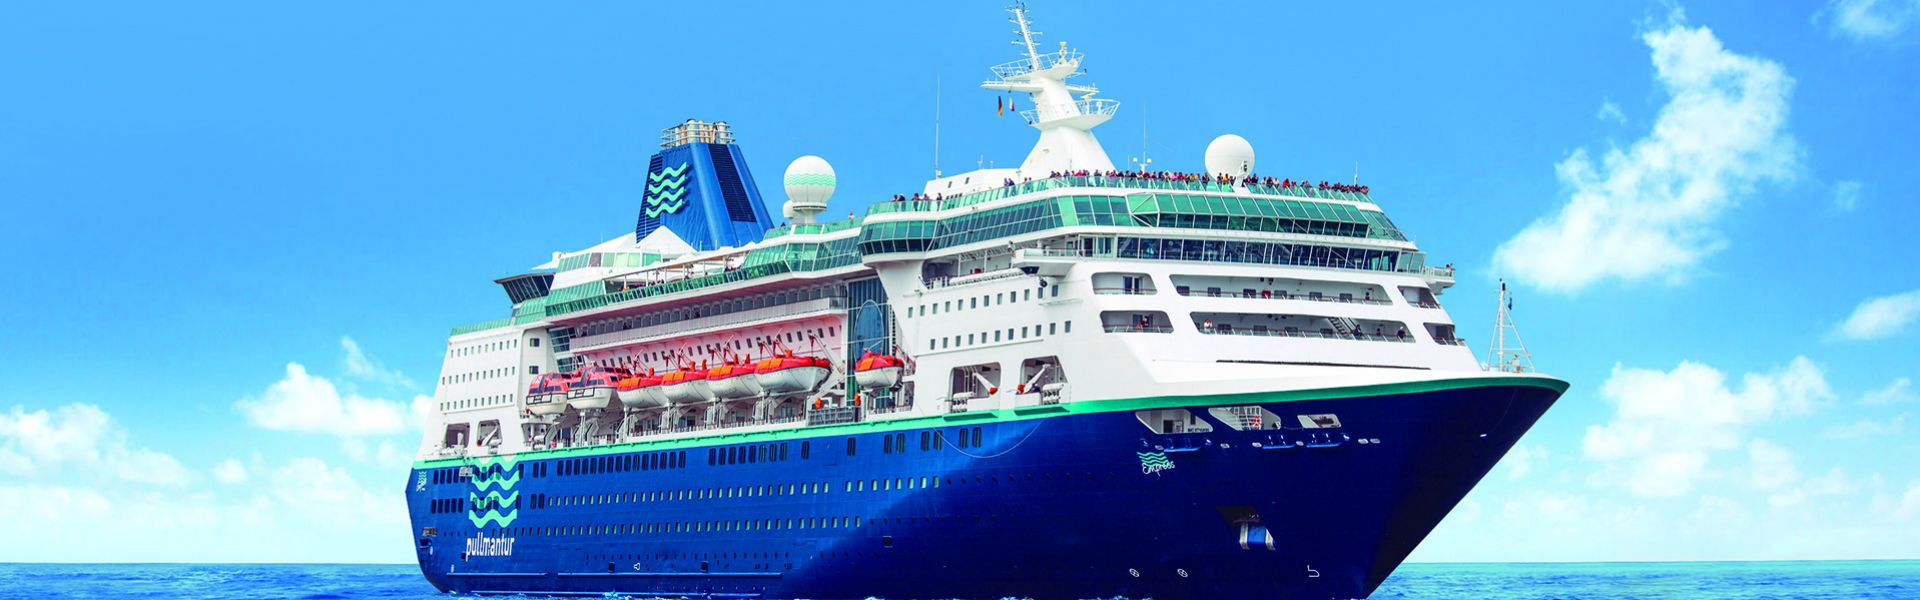 Croaziera 2017 - Insulele Grecesti (Atena) - Pullmantur Cruises - Horizon - 7 nopti